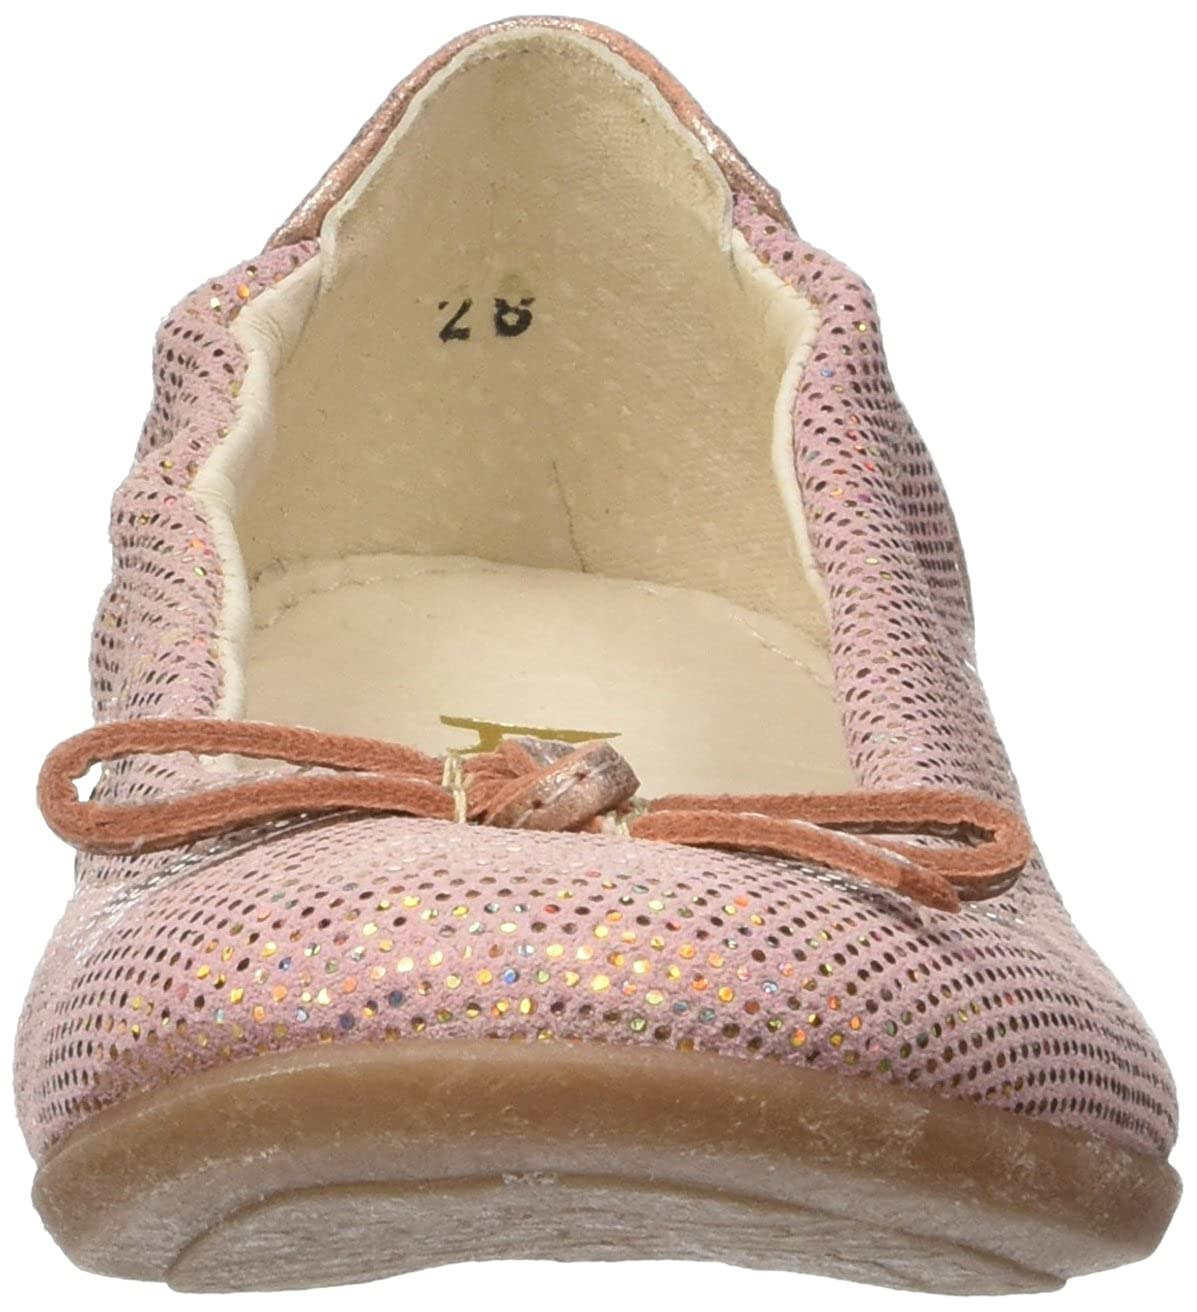 Achile Femme Chaussures Ballerines Sacs et Kiki Bqpwrx6B